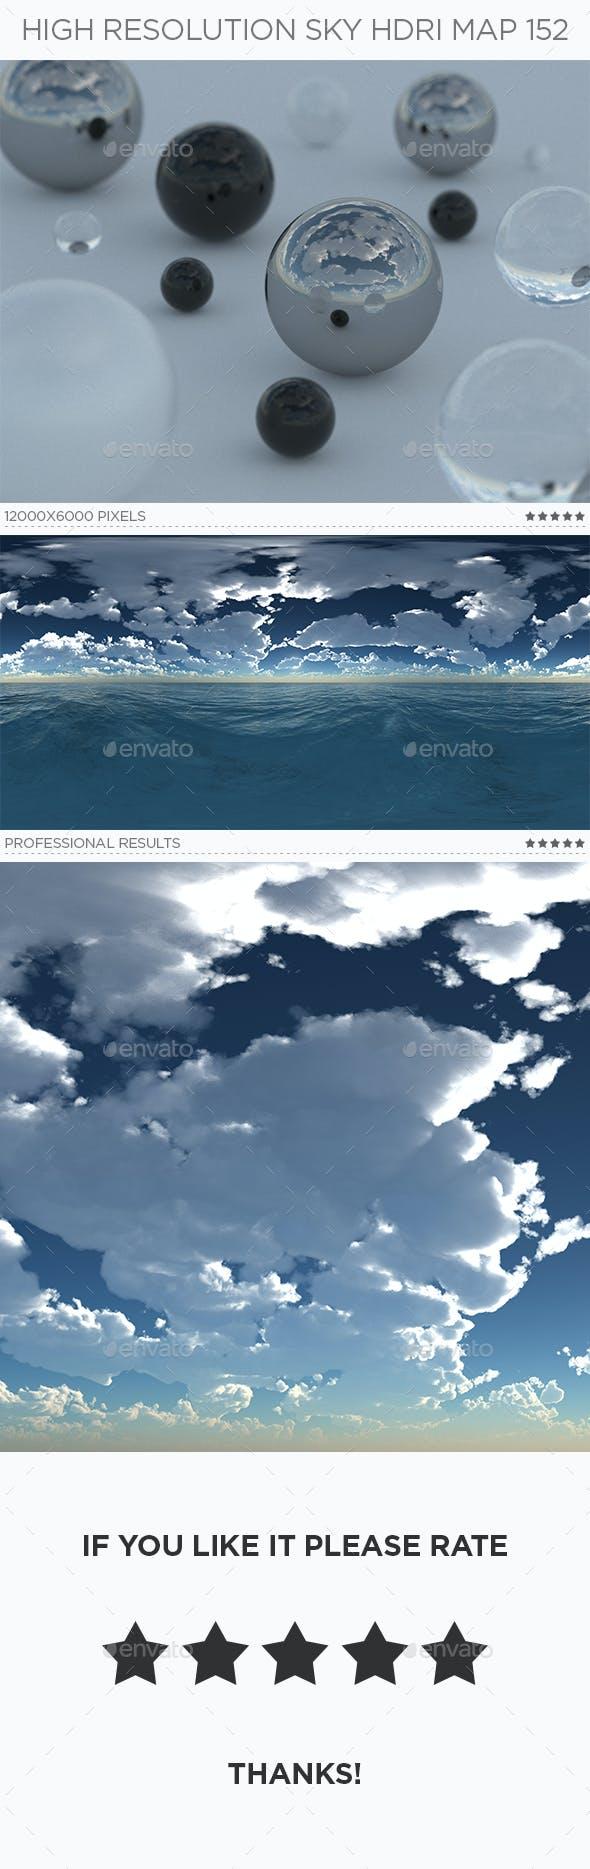 High Resolution Sky HDRi Map 152 - 3DOcean Item for Sale